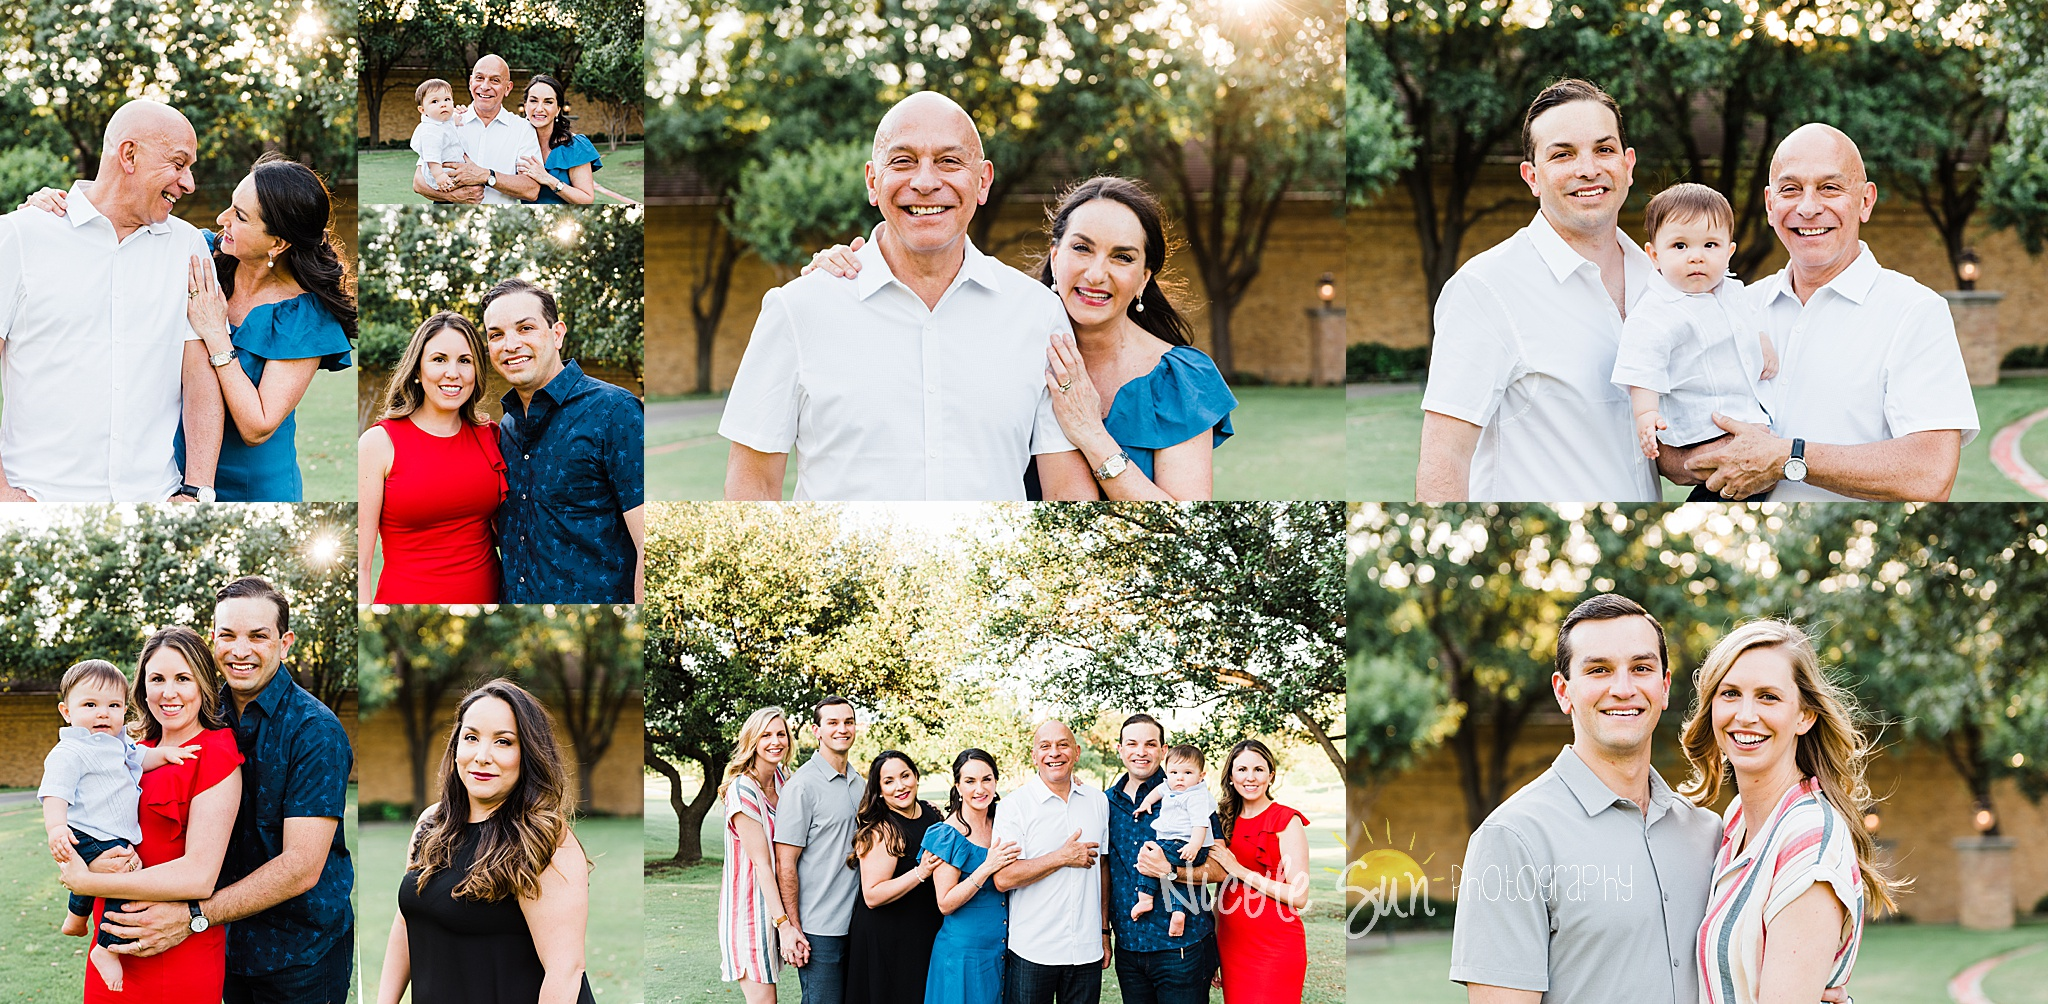 dfwextdedfamilyphotography.jpg